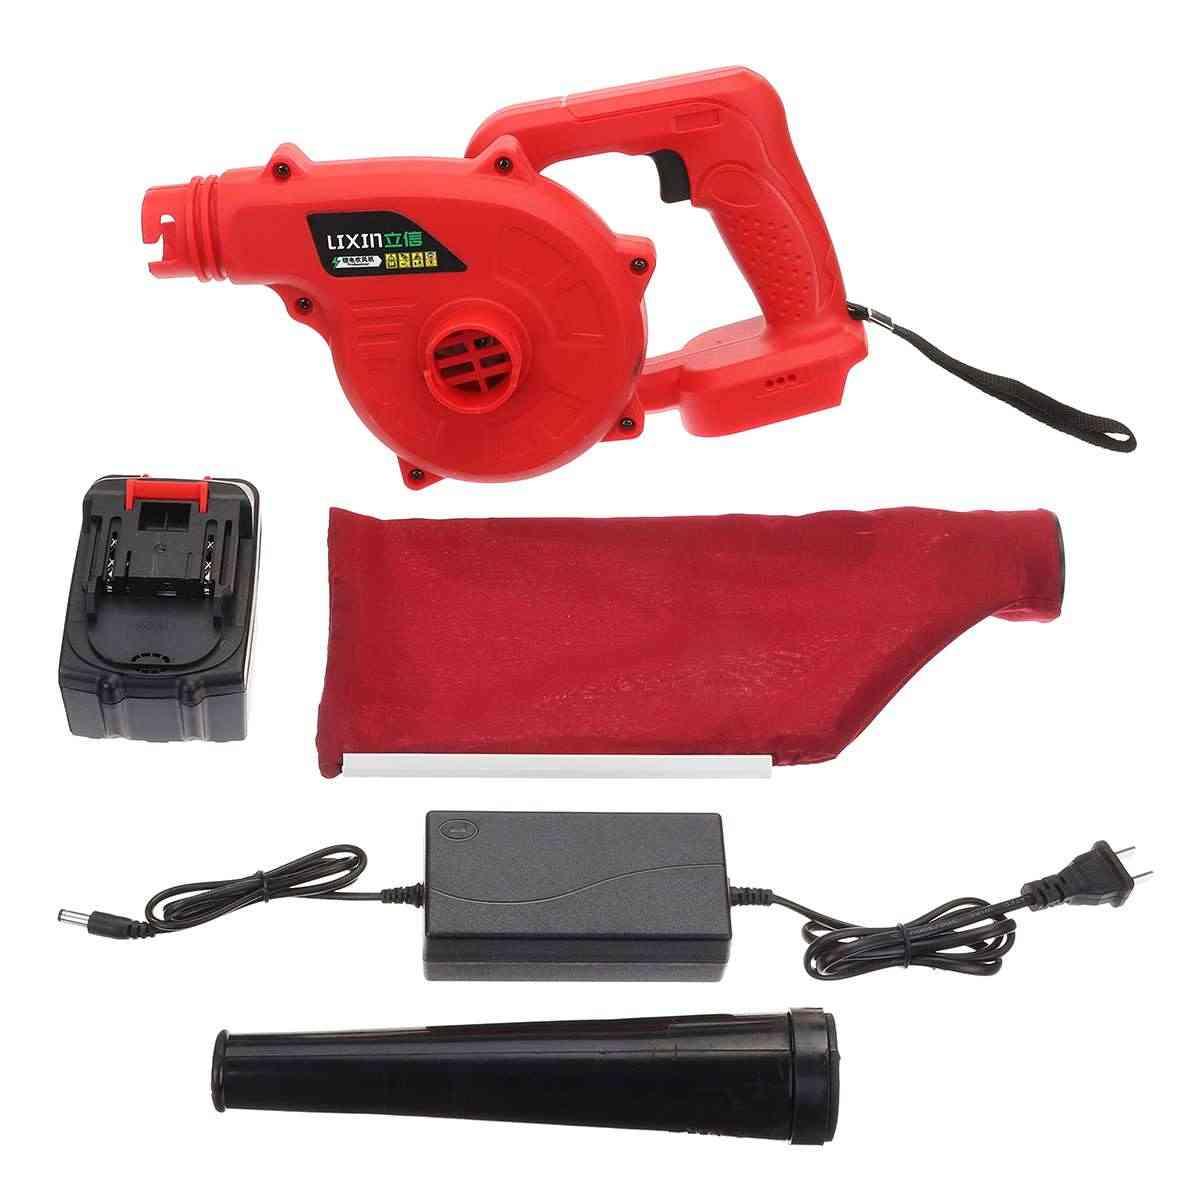 Handheld Cordless Blower Dust Sweeper Vacuums